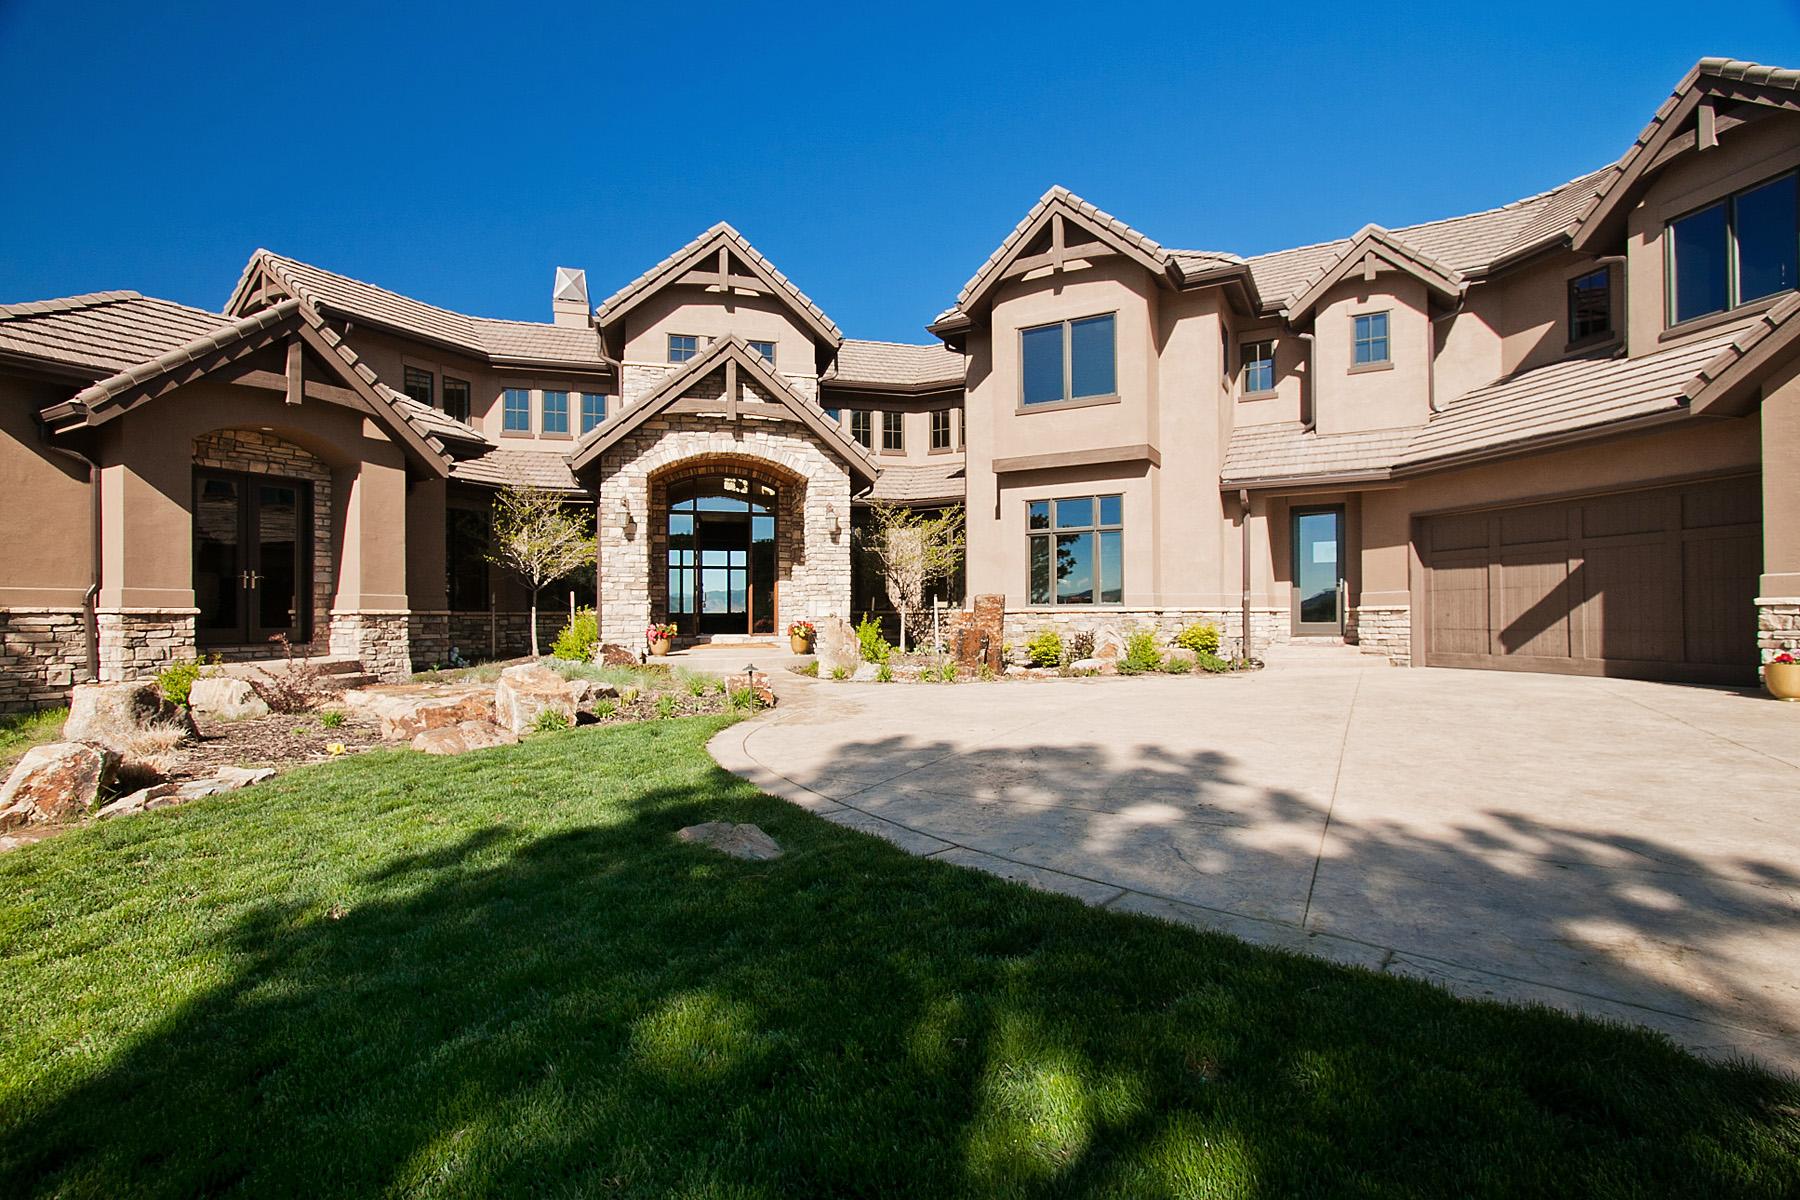 Fullersothebysrealty Colorado Luxury Real Estate And Market News - Colorado springs luxury homes